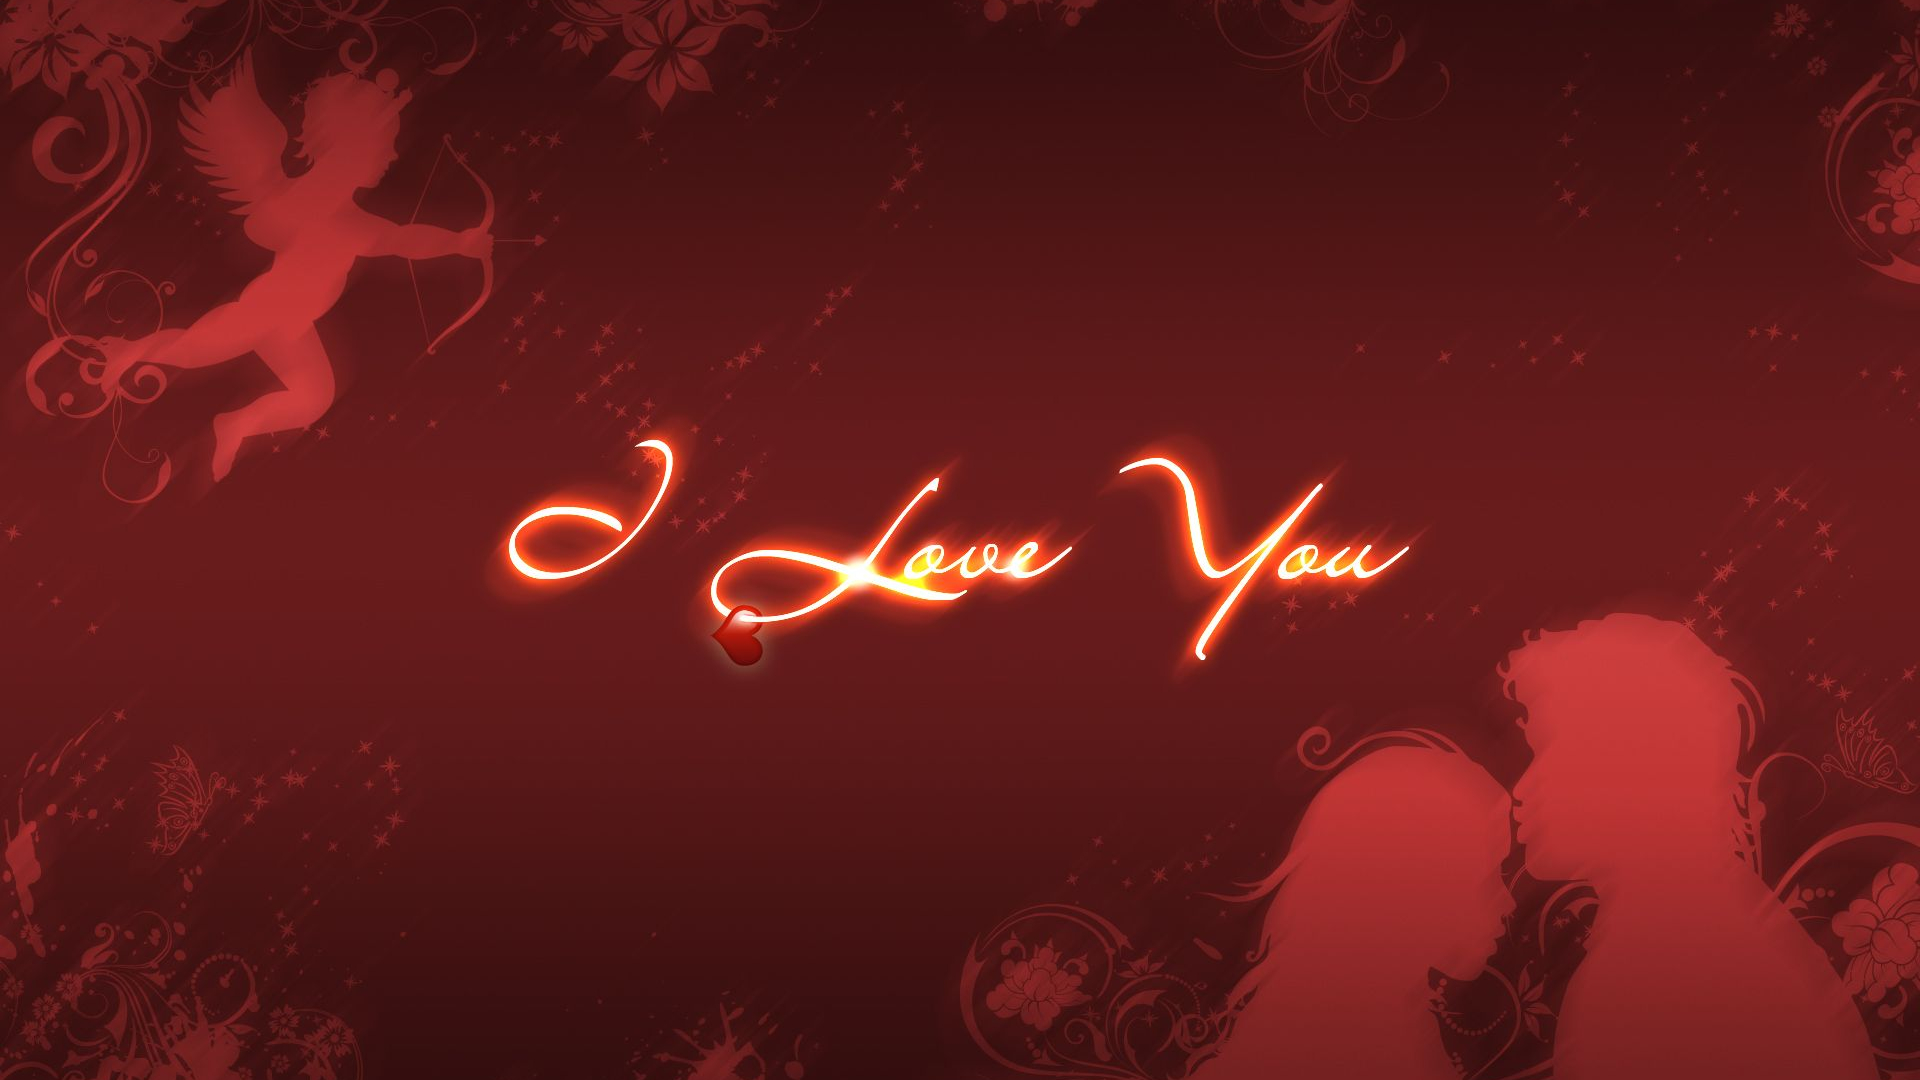 Free Download Best I Love You Desktop Wallpapers Background